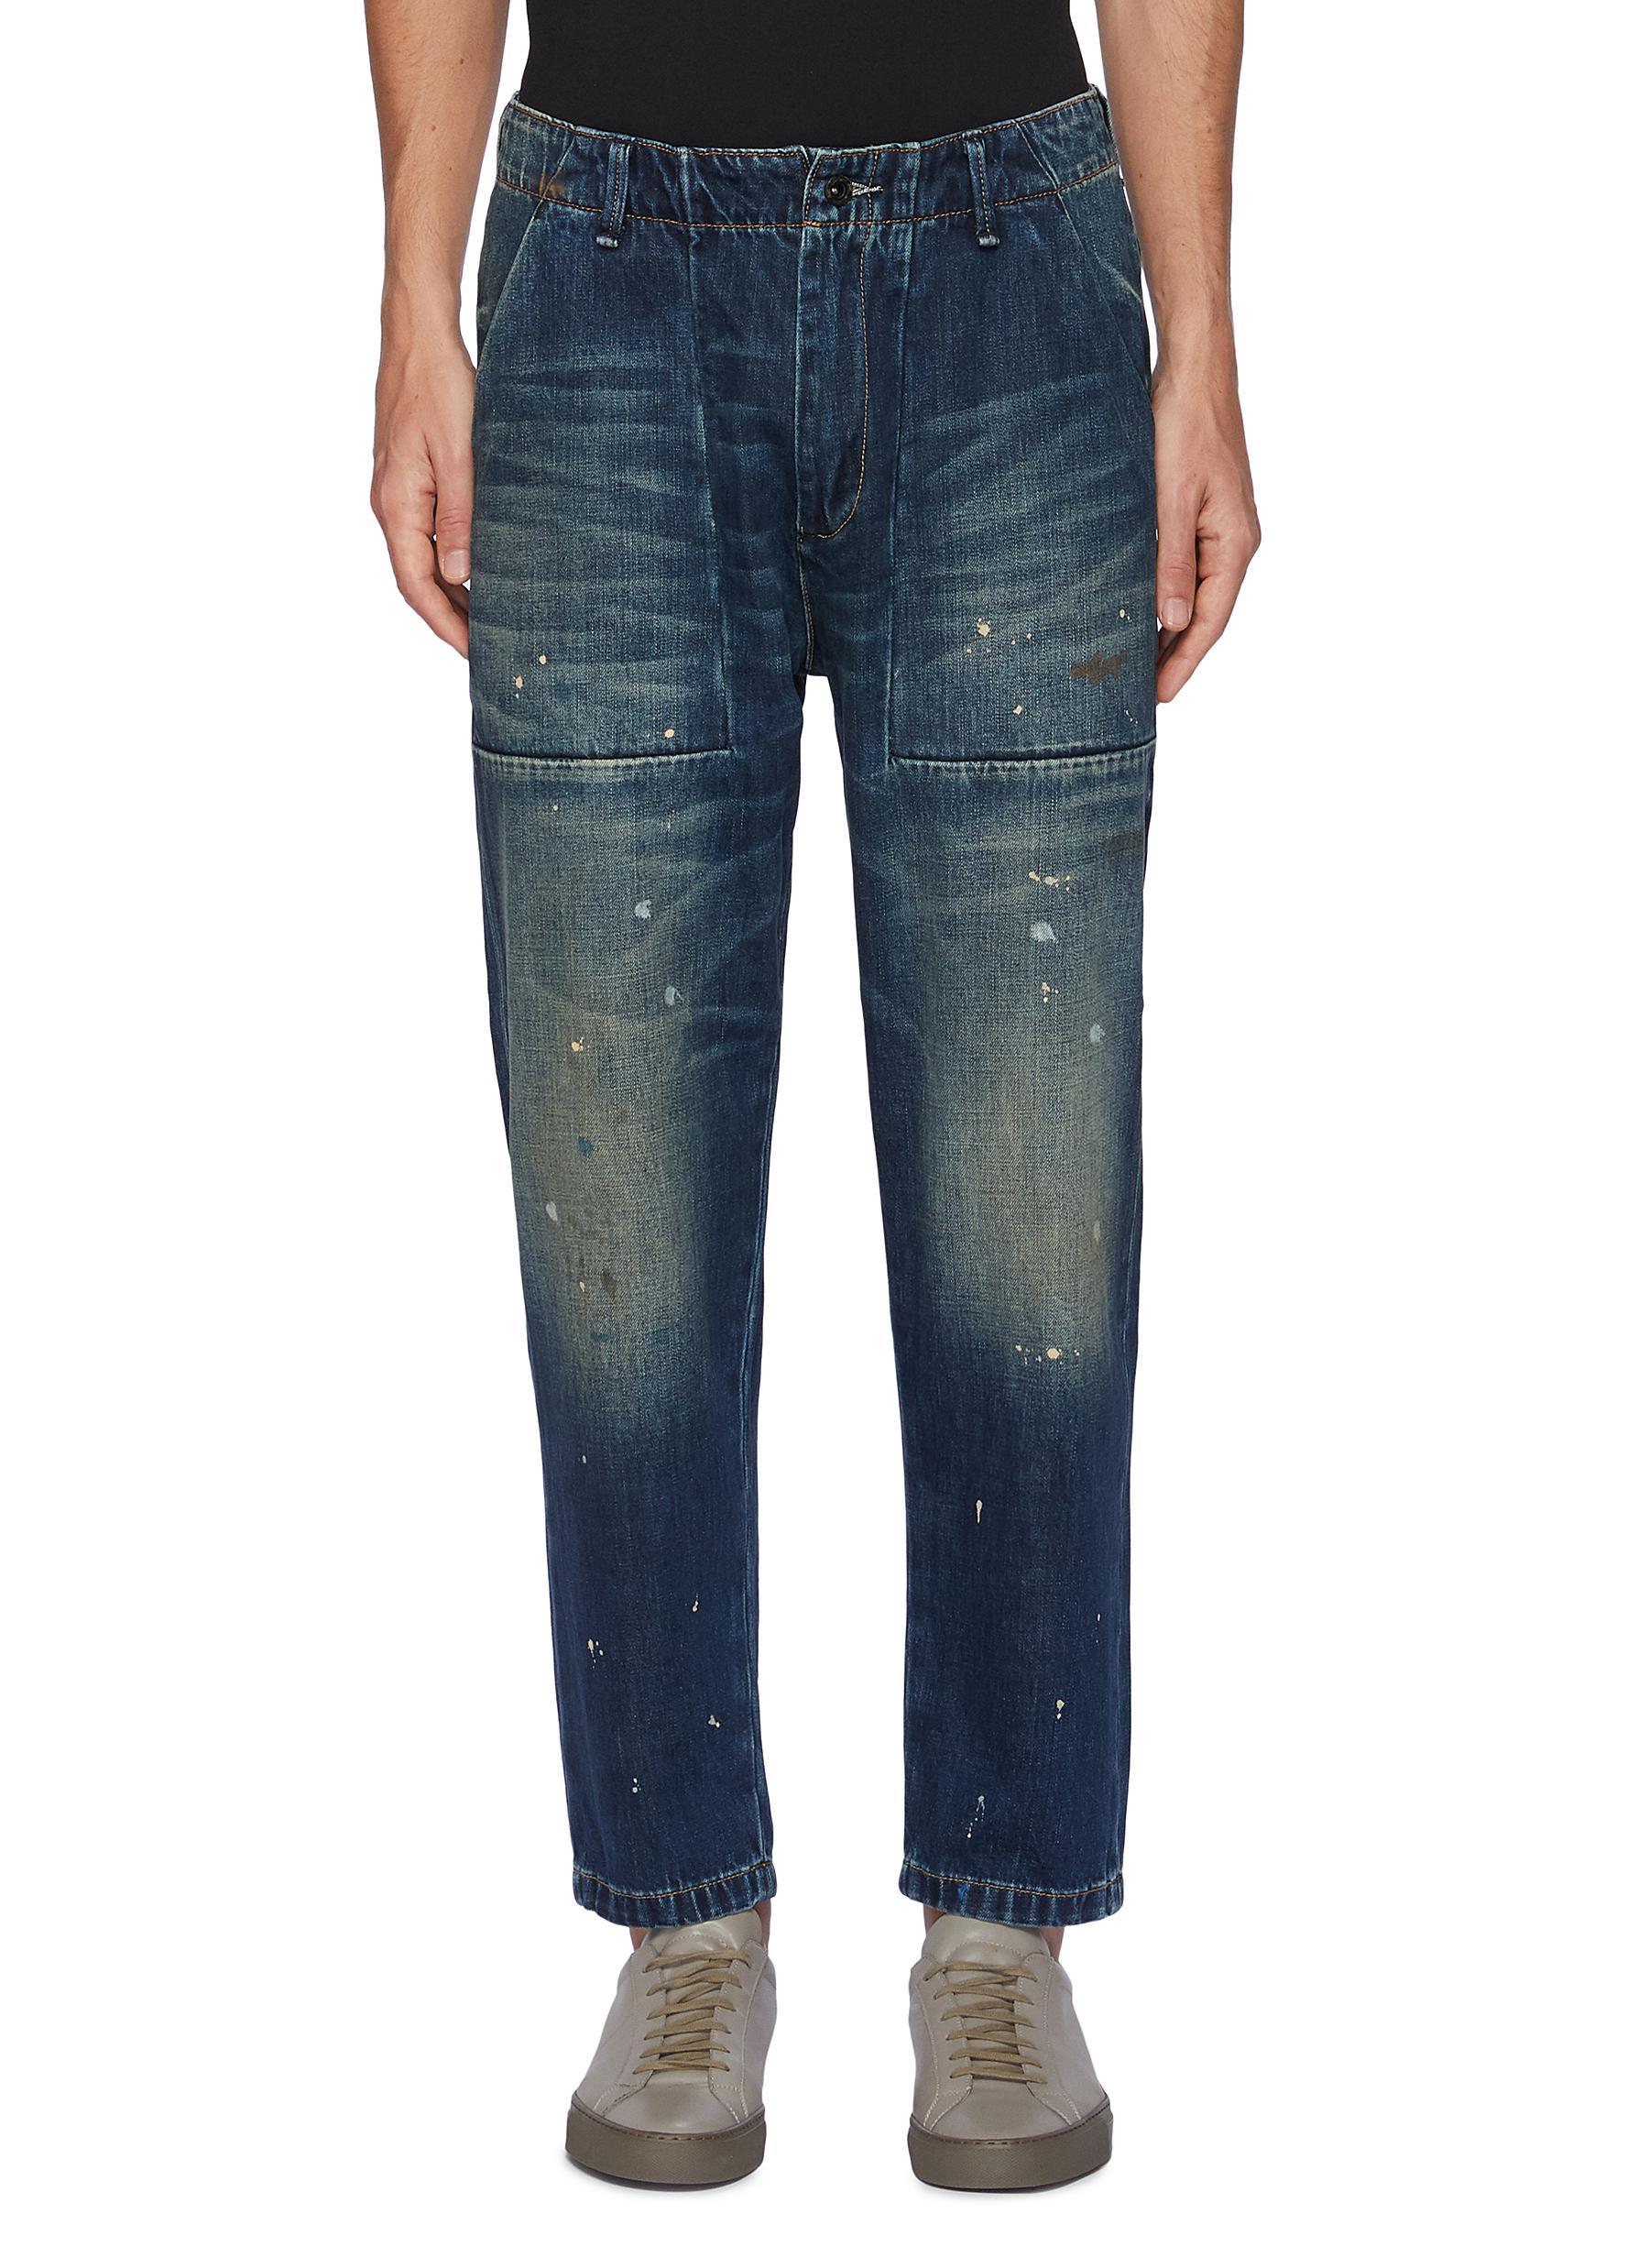 Splash Paint Patch Pocket Jeans - DENHAM - Modalova